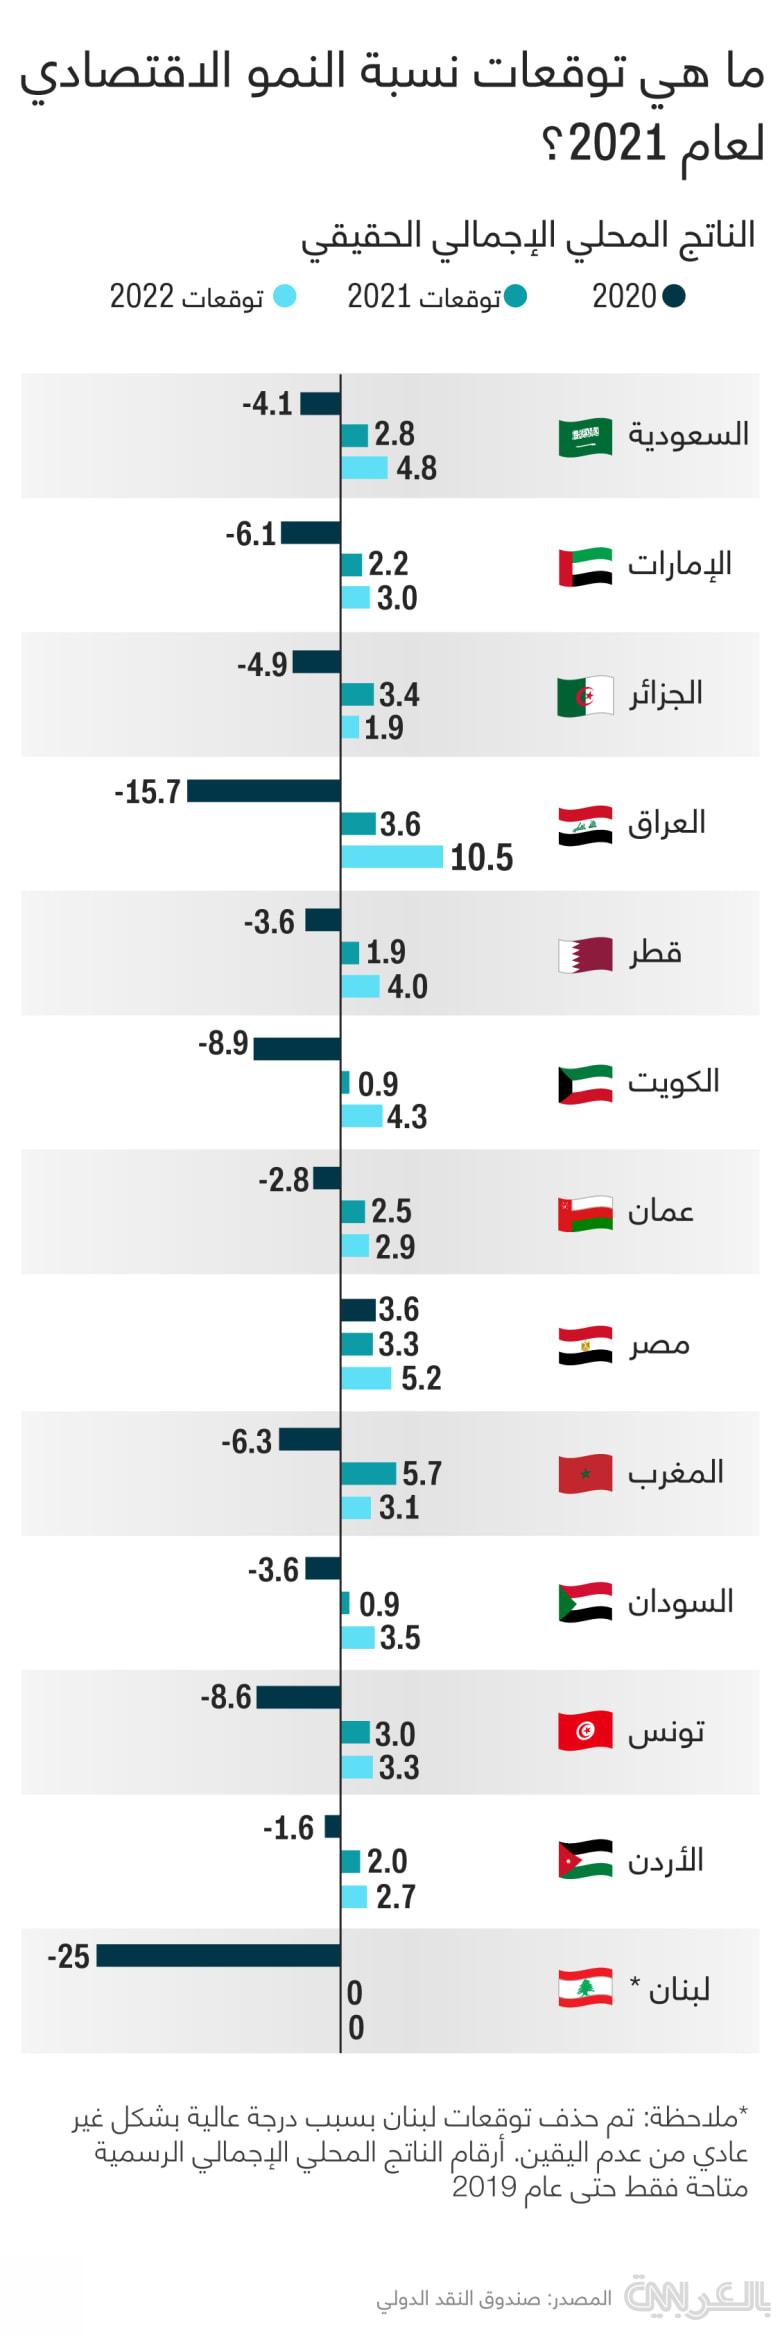 Arab-Oil-GDP-2020-2021